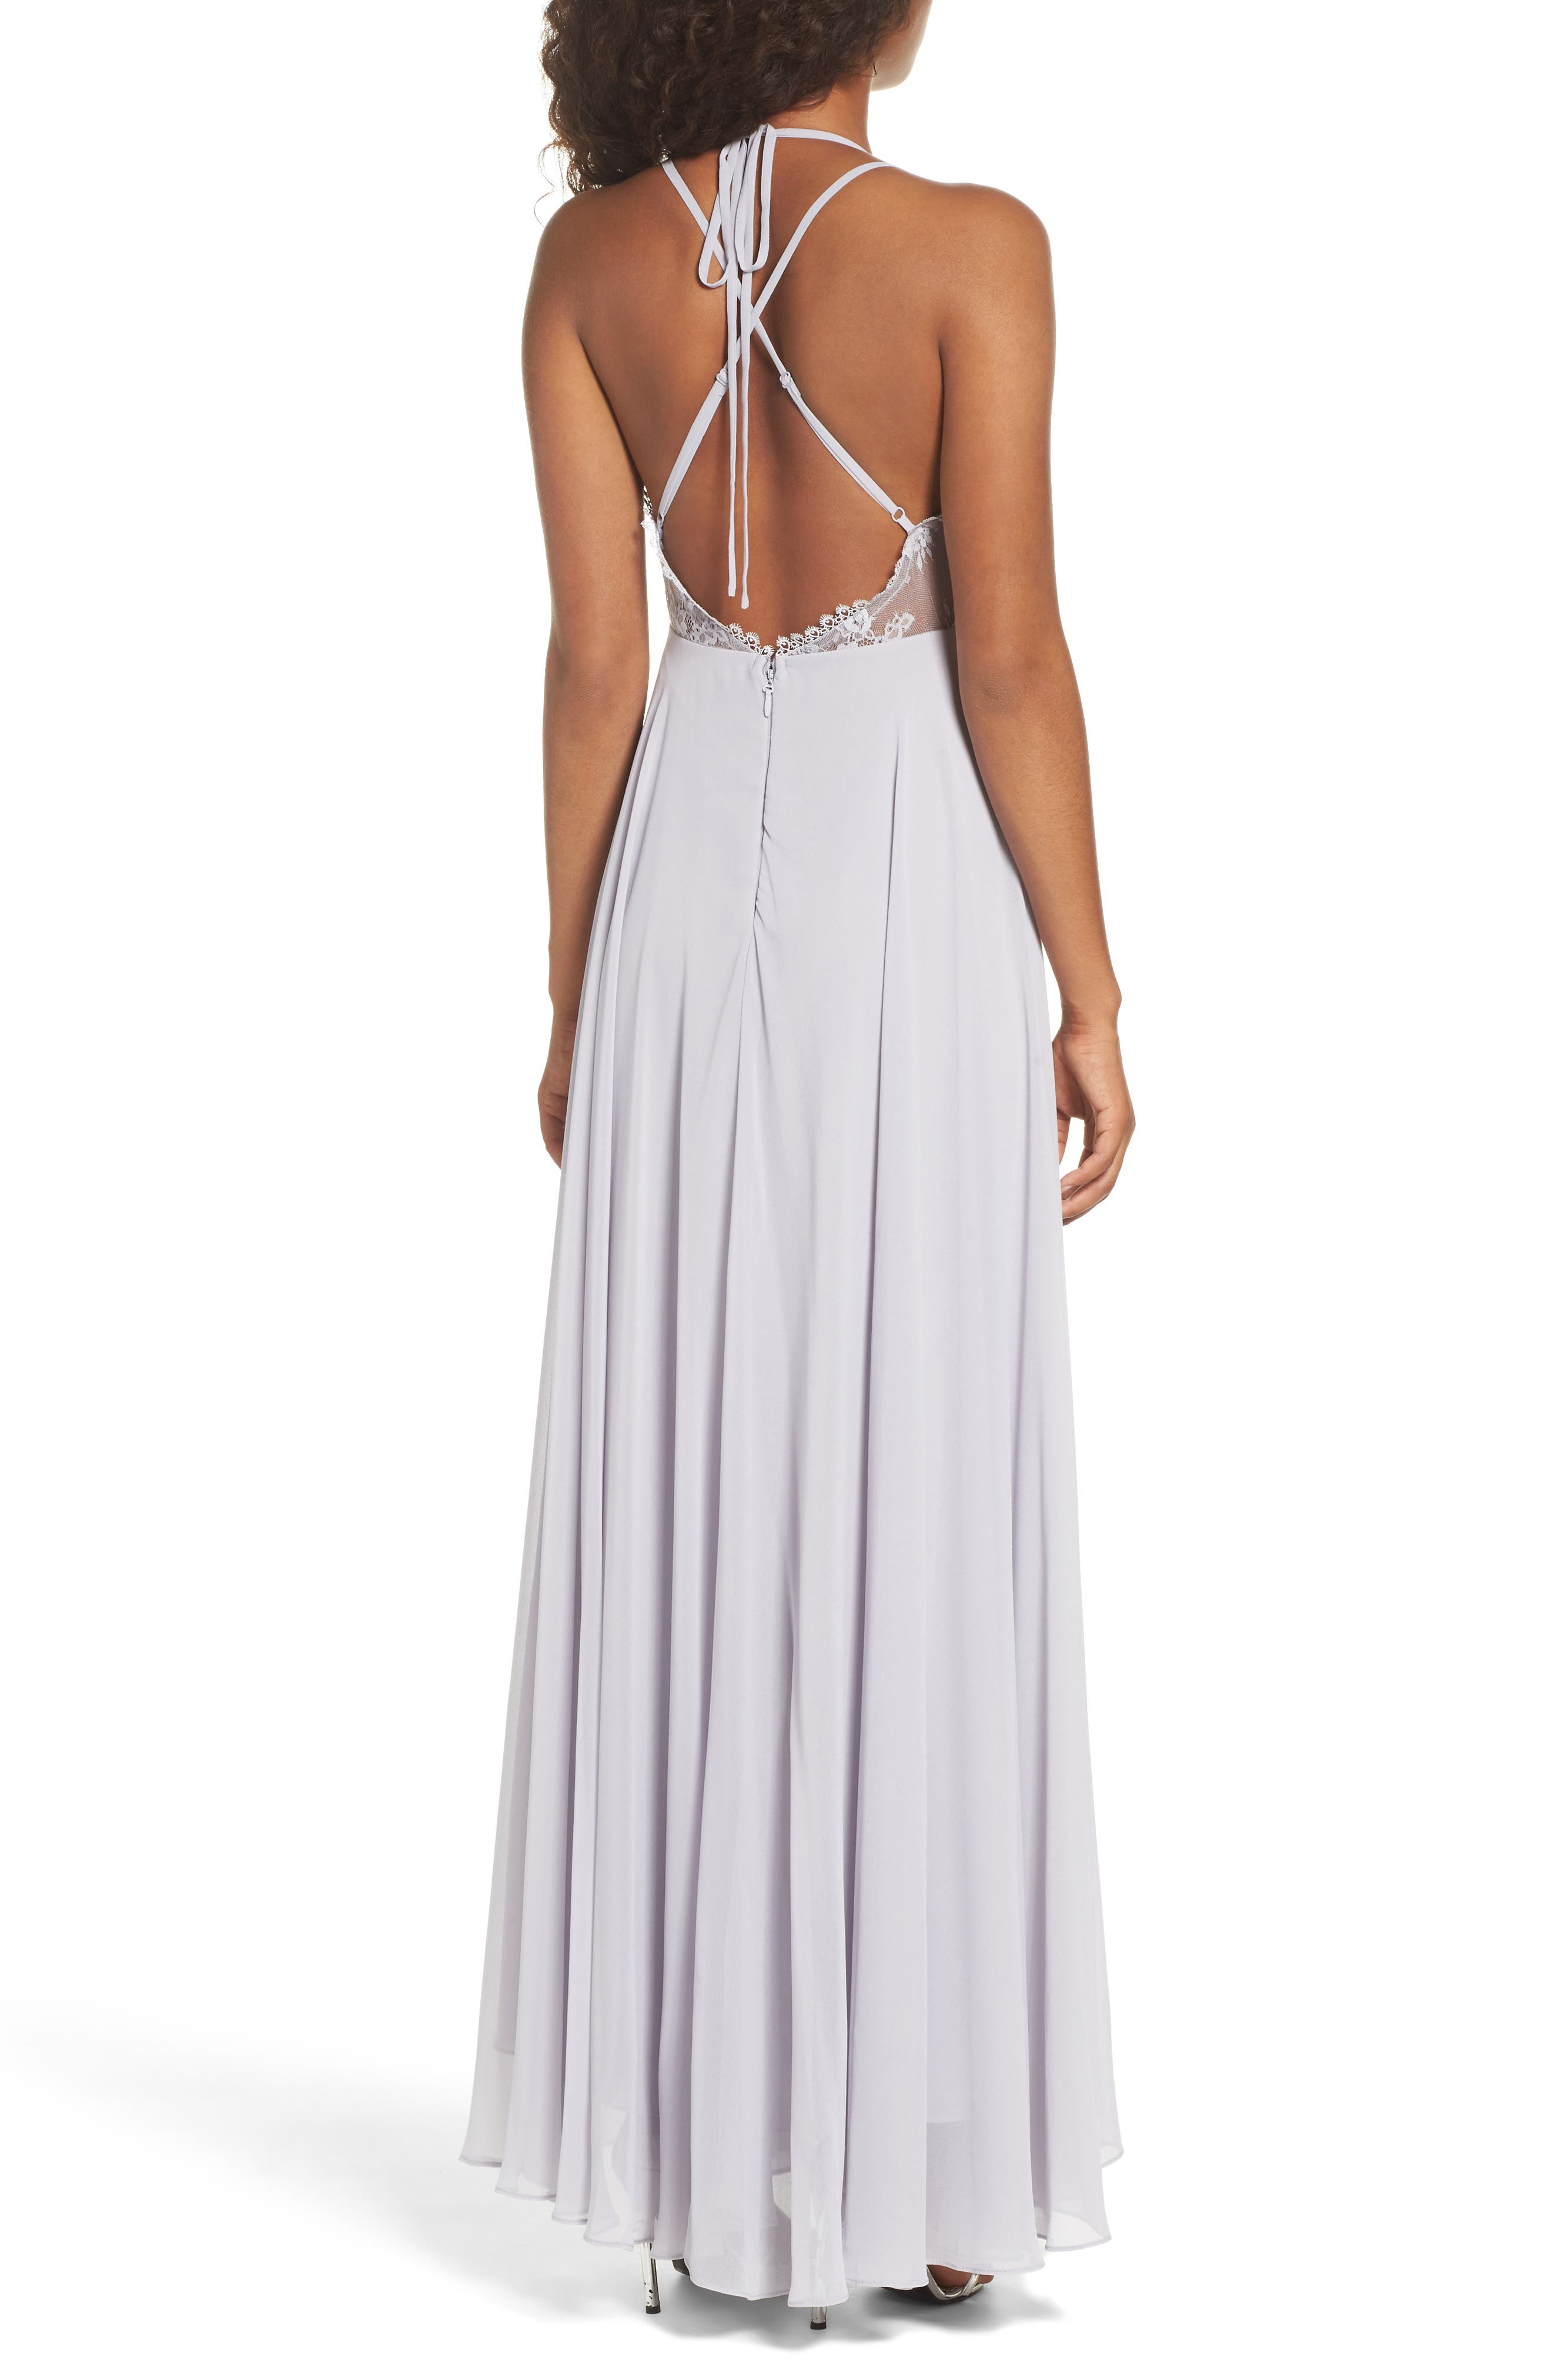 Alternate Image 2  - Lulus Celebrate the Moment Lace Trim Chiffon Maxi Dress